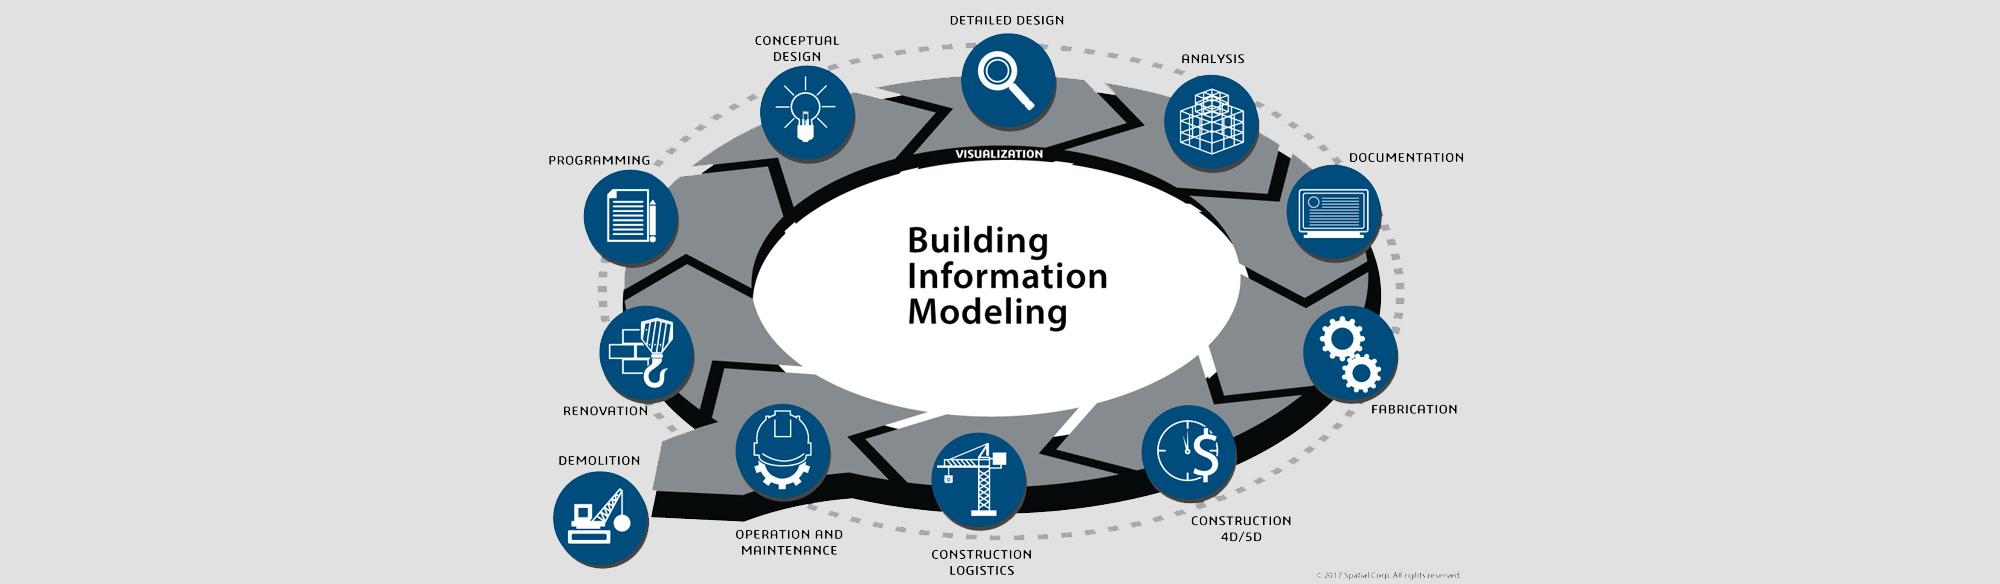 Fasi del building information modeling